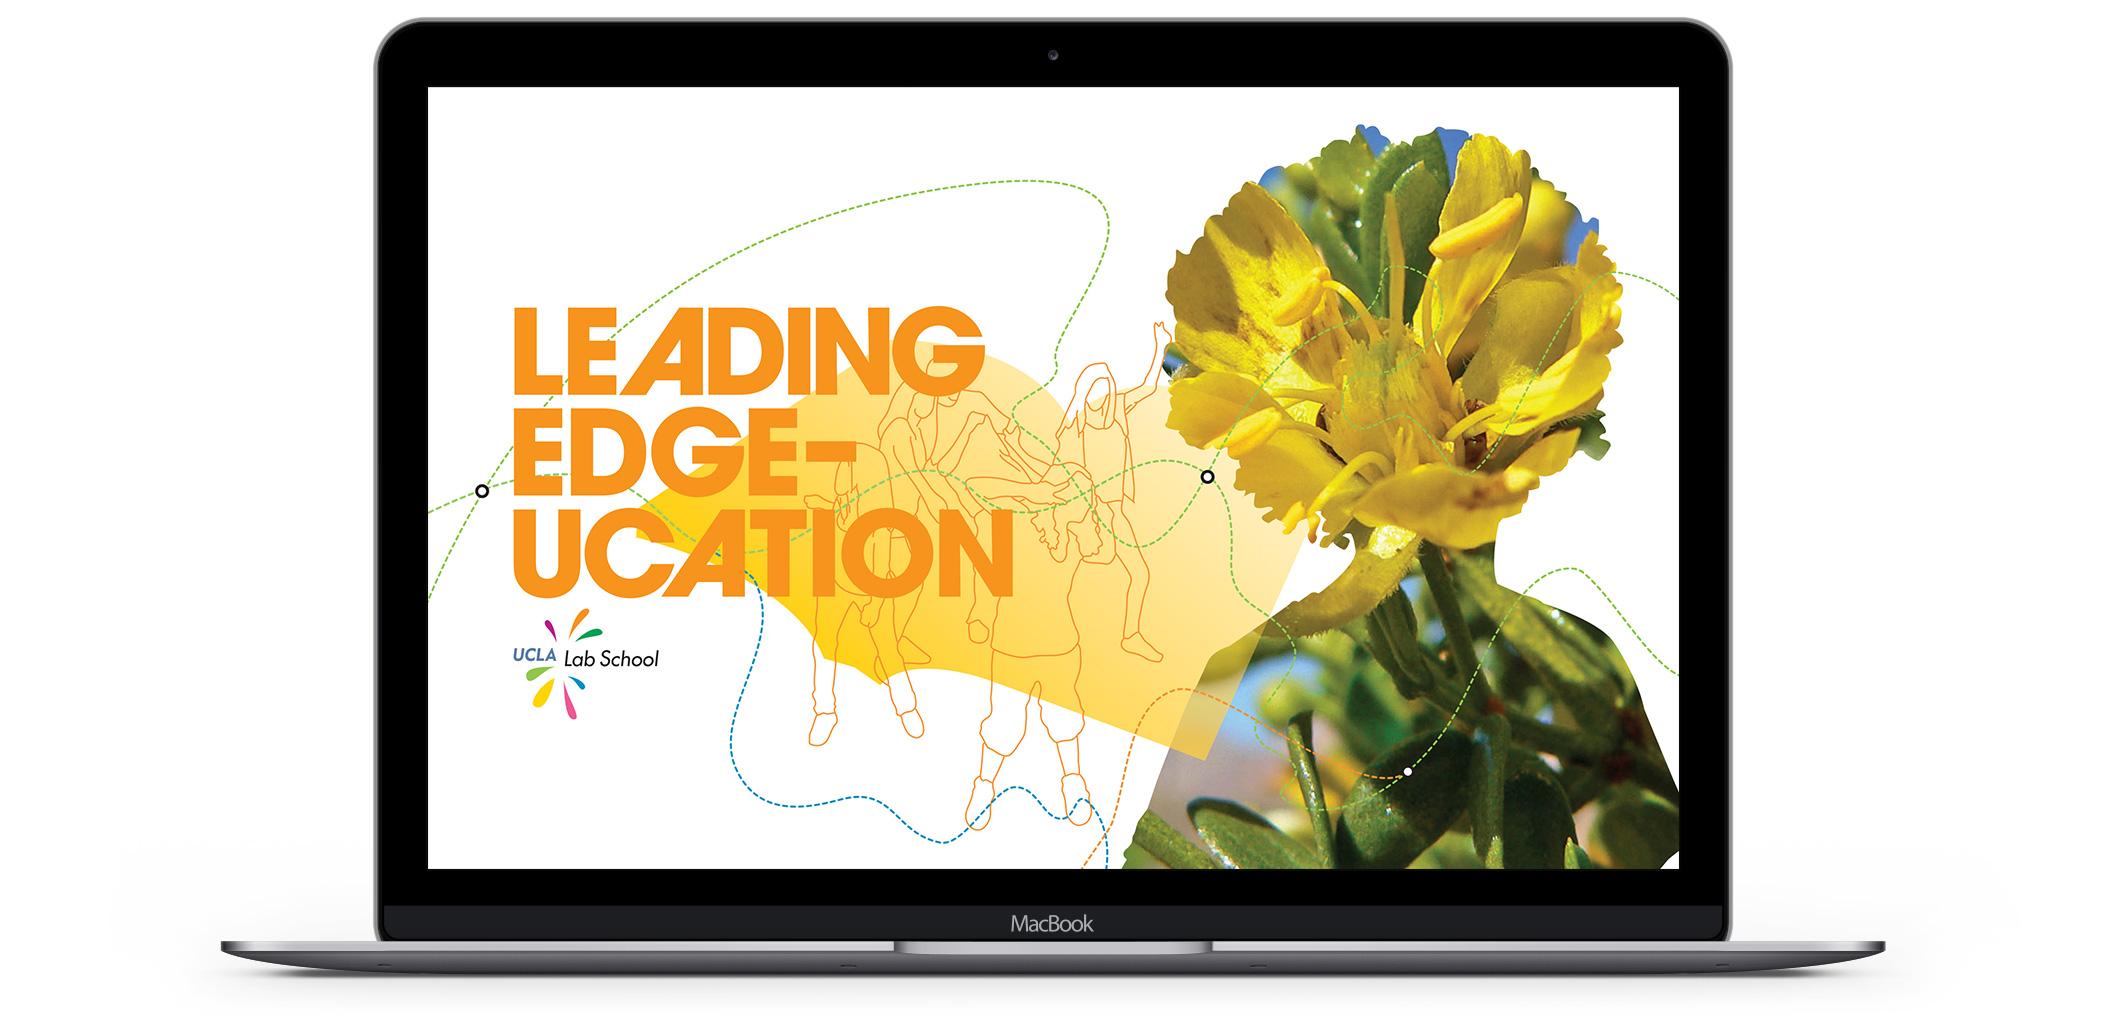 UCLA_Lab_School-Laptop-Tagline@2x.jpg